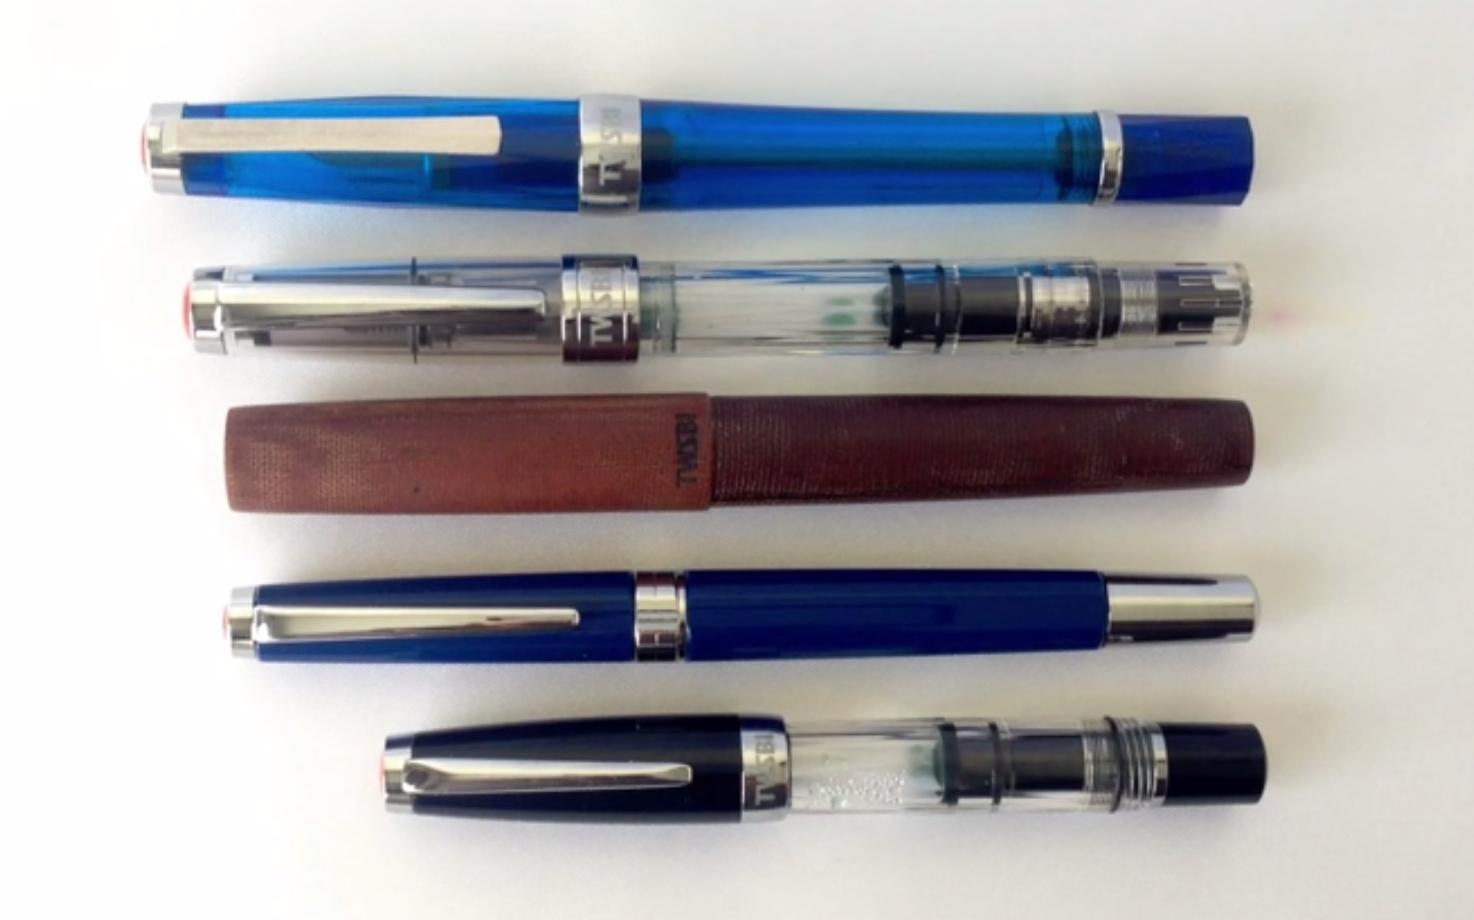 Twsbi Classic Fountain Pen Review The Nibsmith Parts Diagram Model Comparison